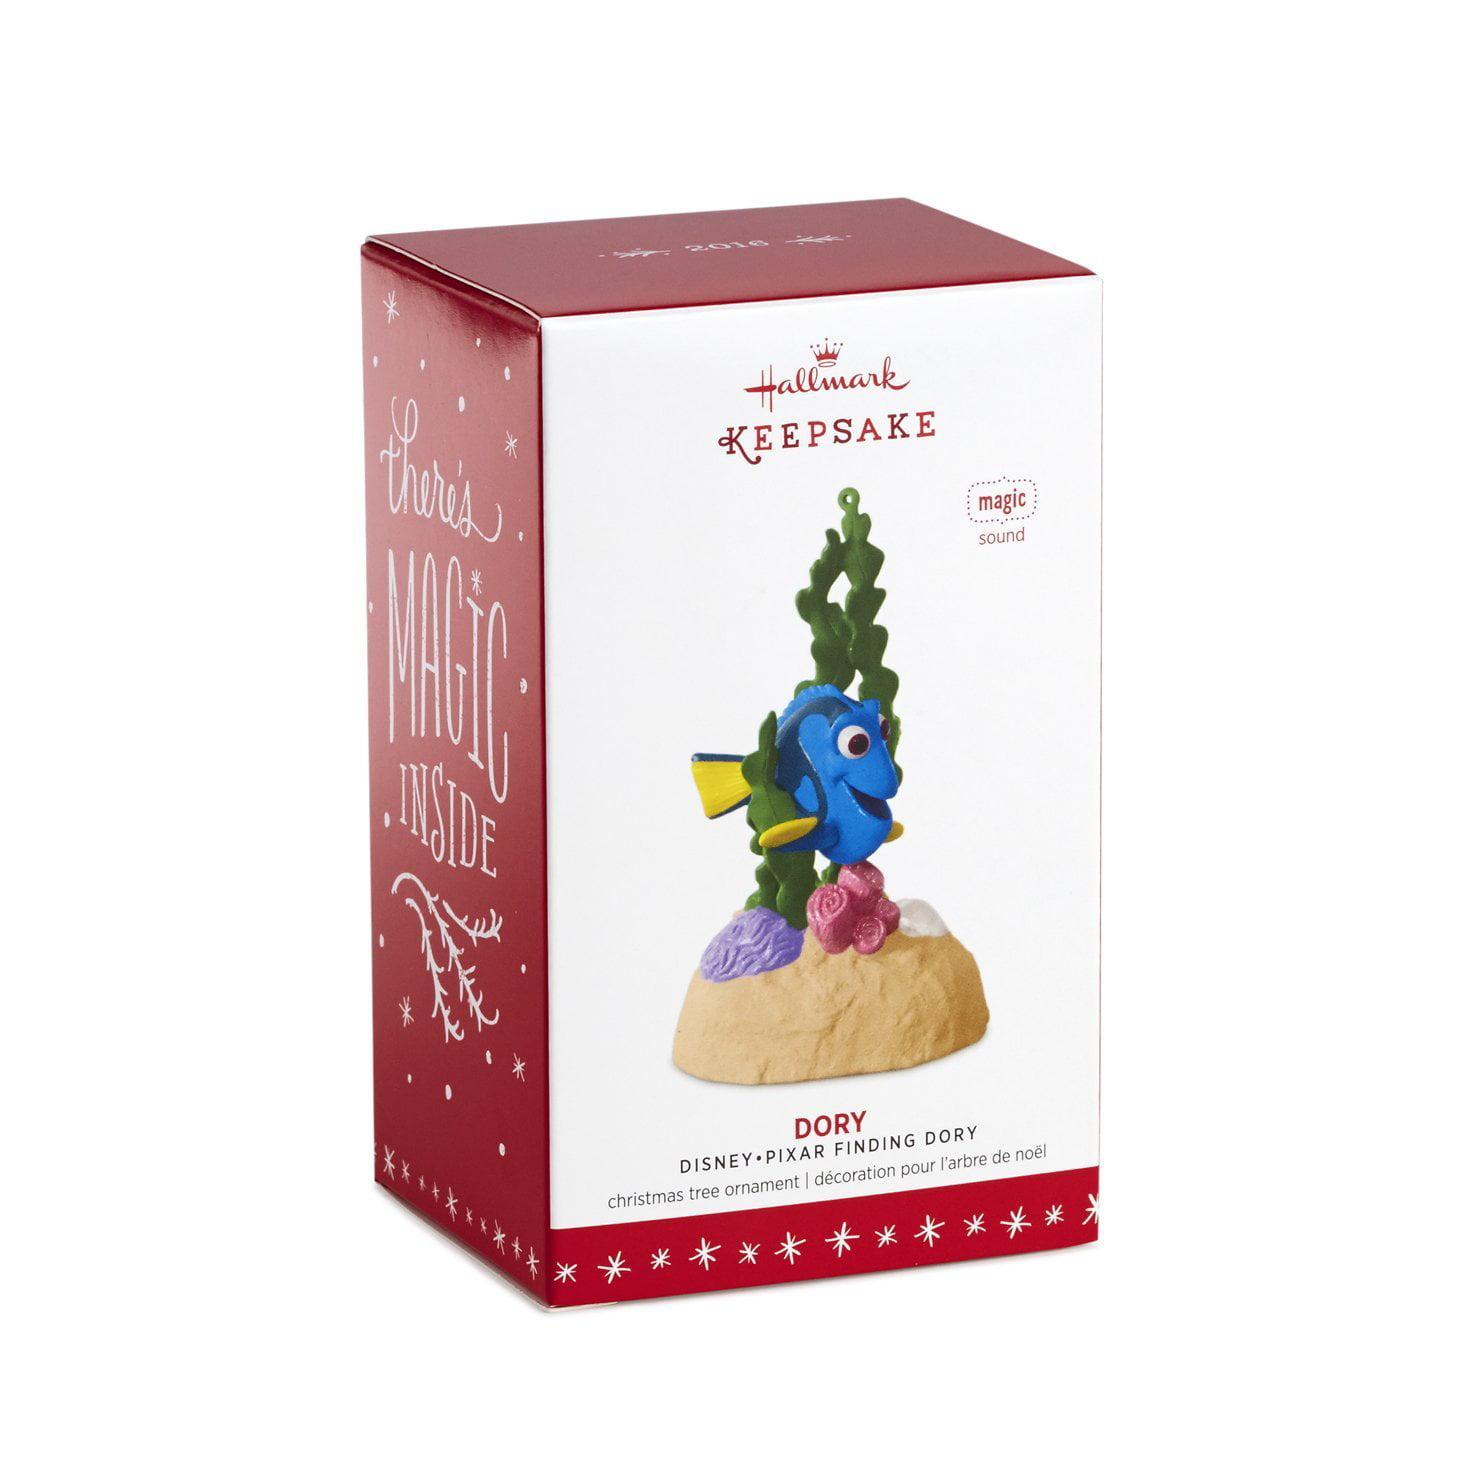 Halllmark Keepsake 2016 Disney/Pixar Finding Dory Christmas Ornament